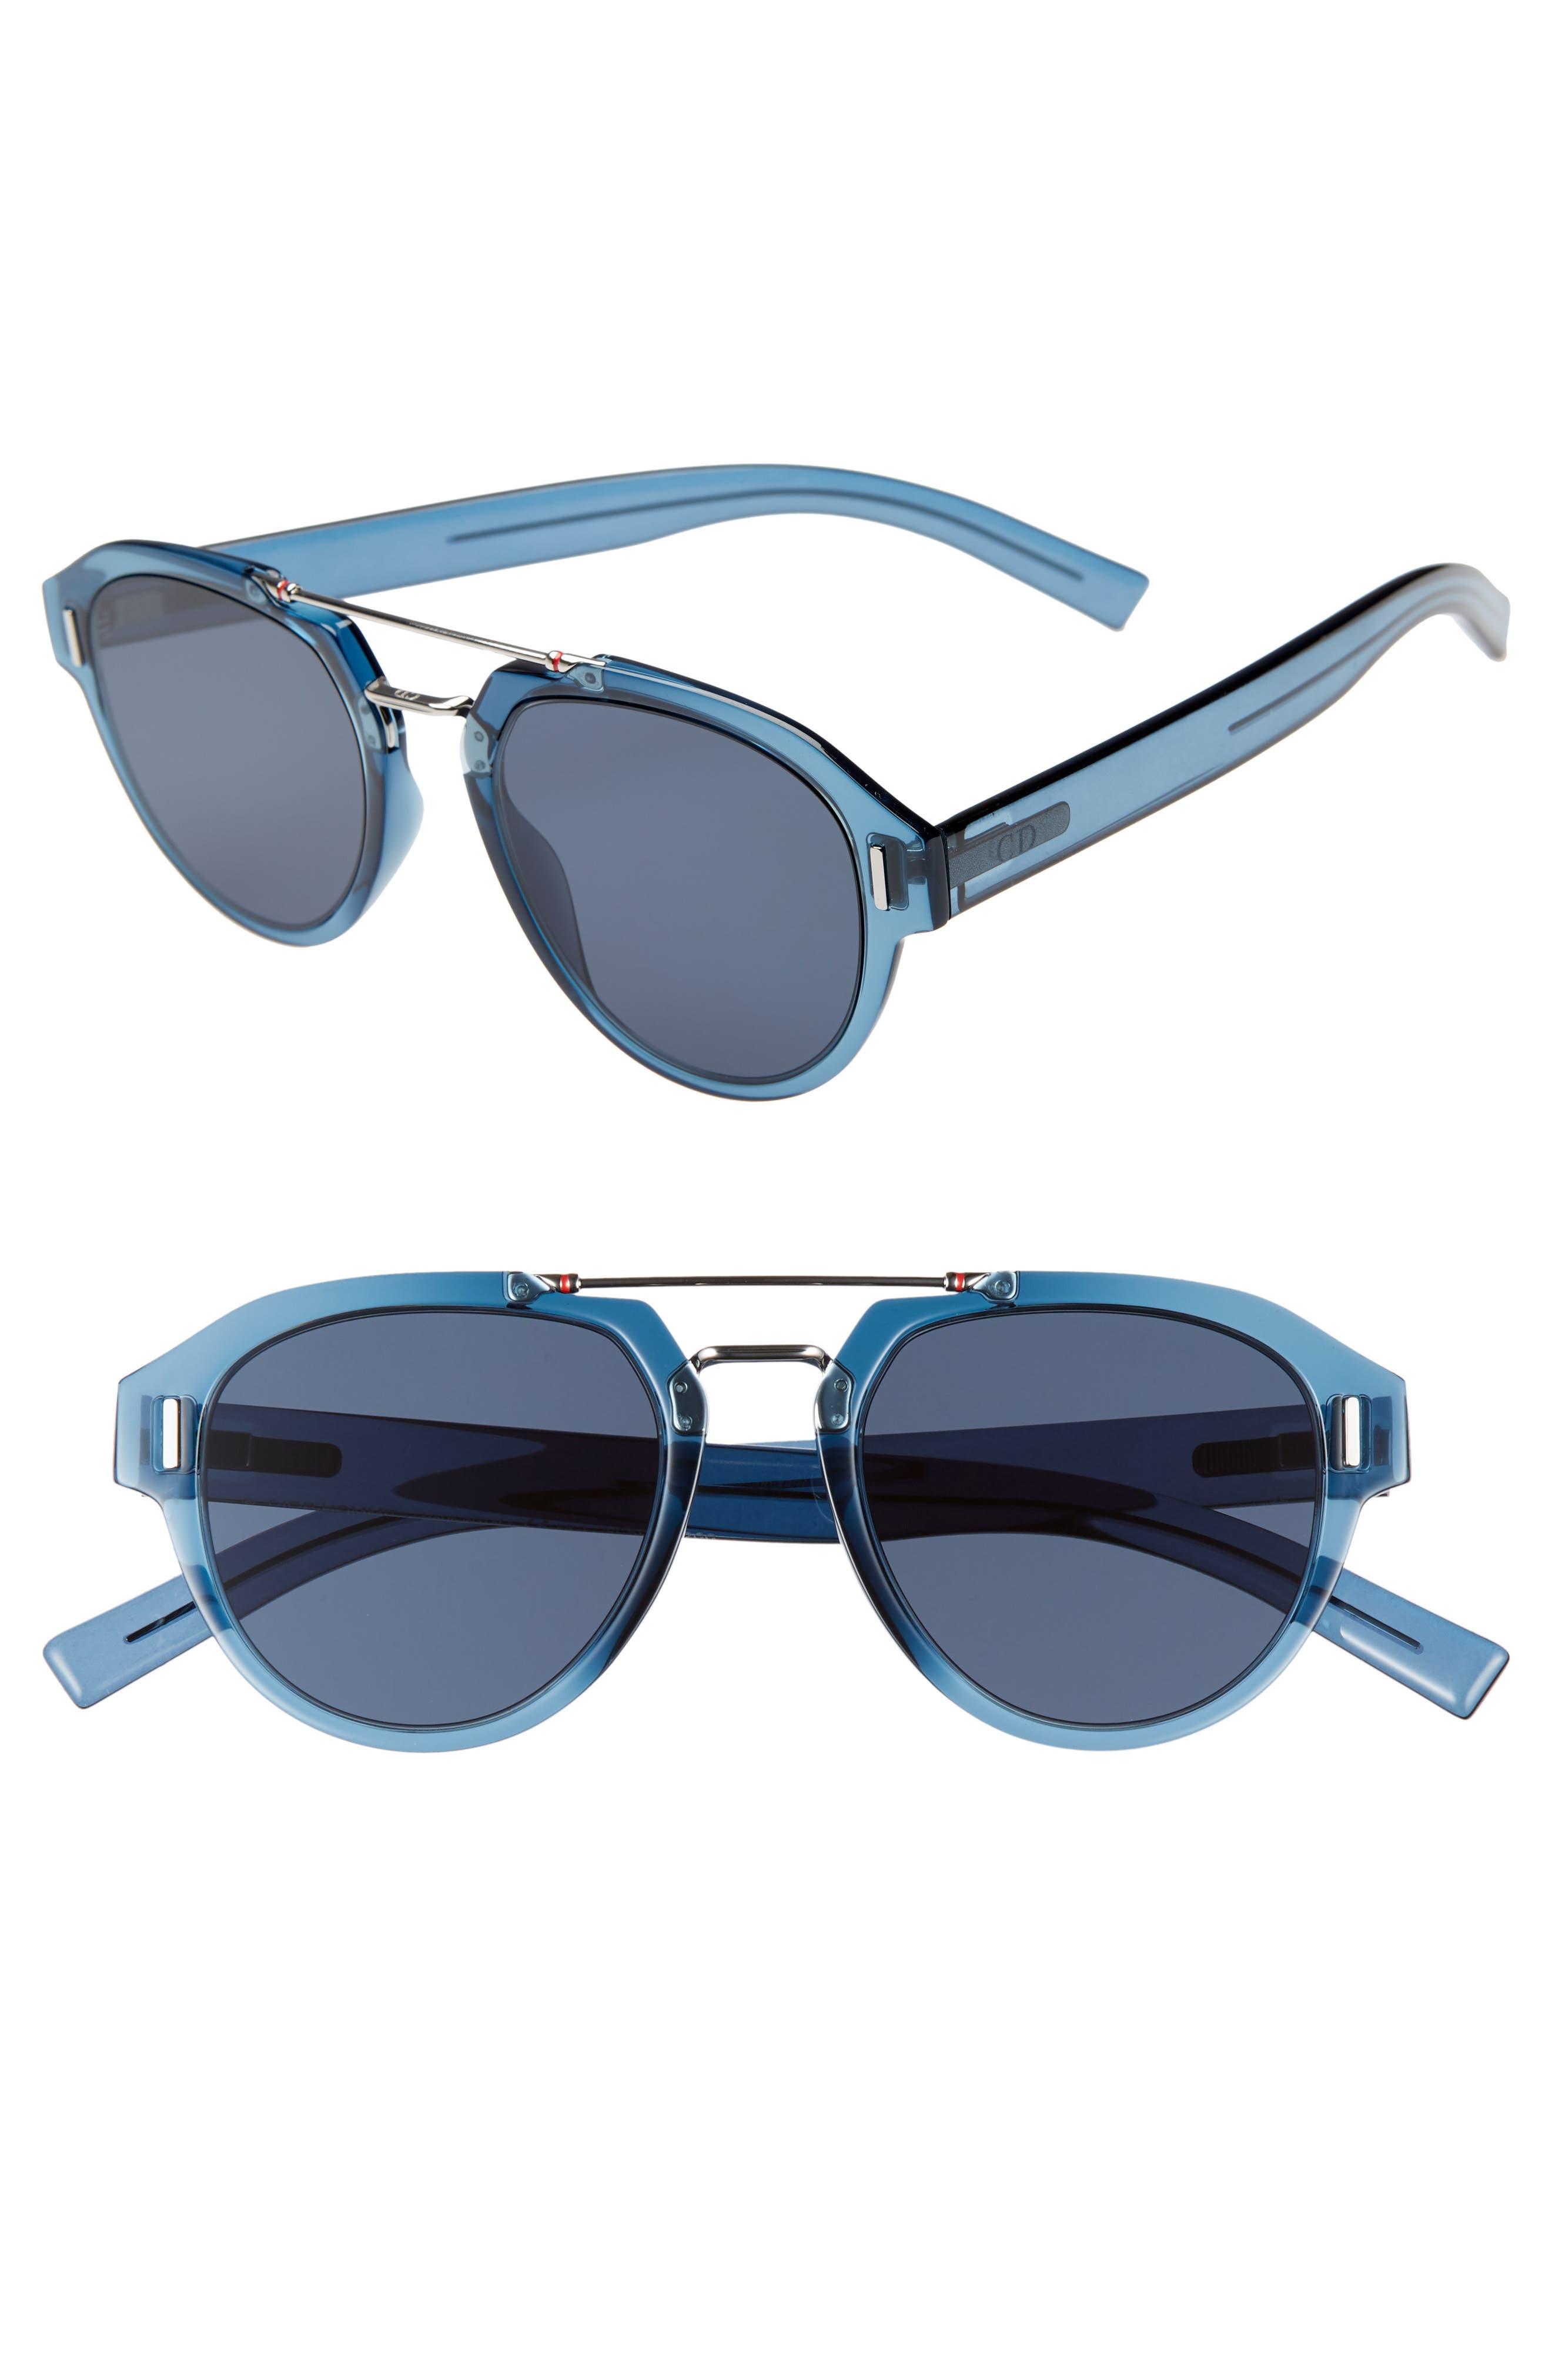 3a66b54625e Men s Dior Homme Sunglasses   Eyeglasses